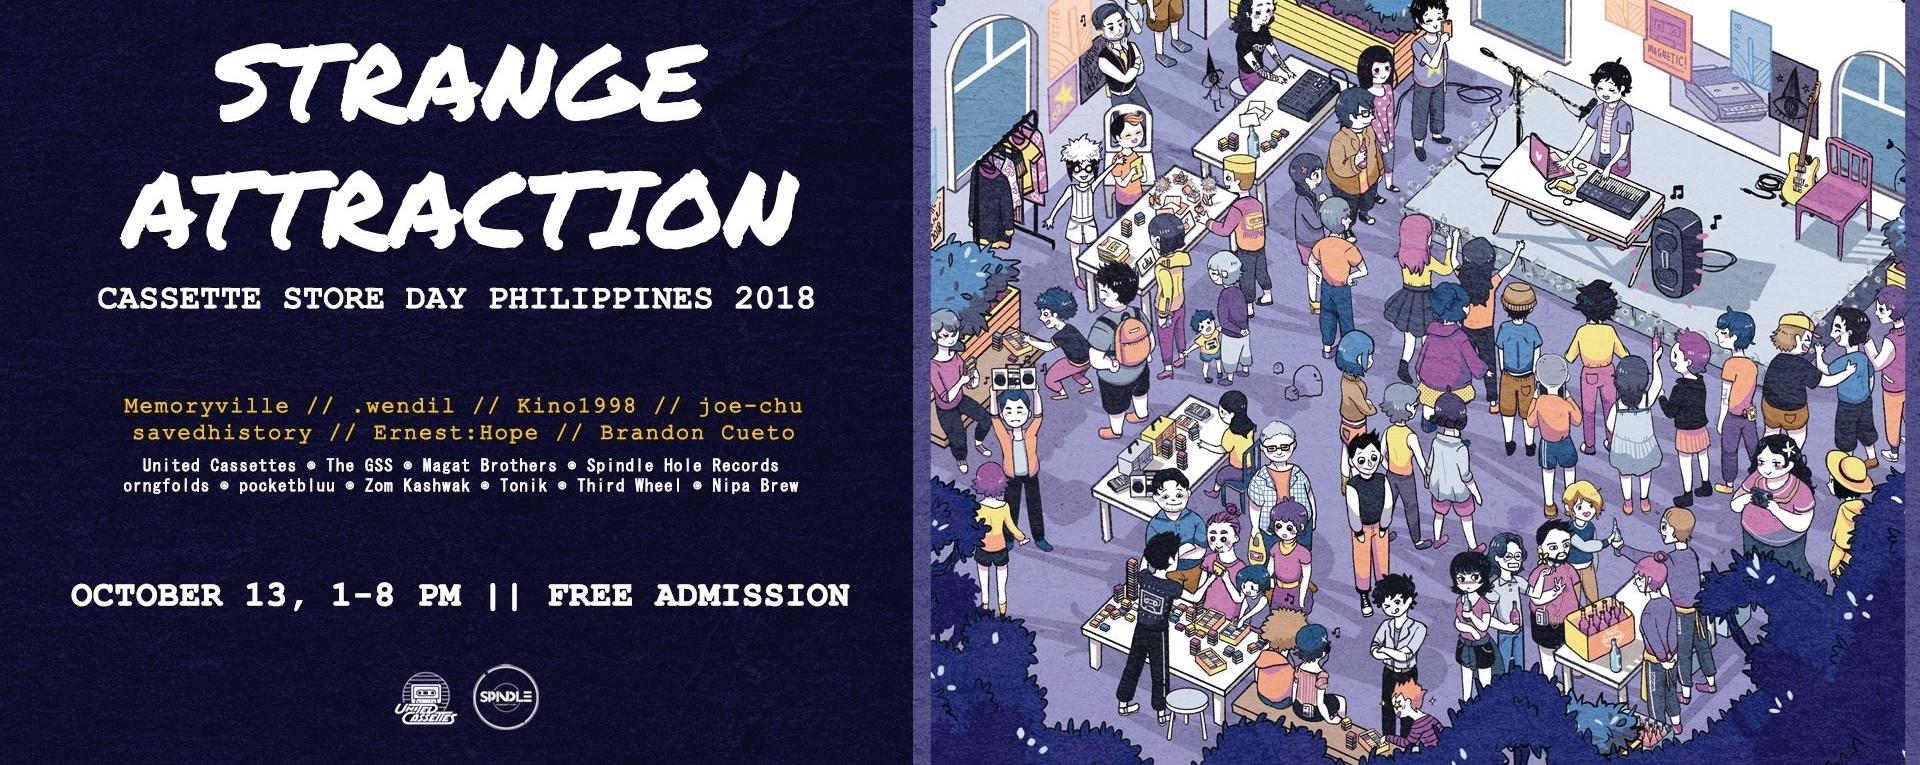 Cassette Store Day Philippines 2018: Strange Attraction